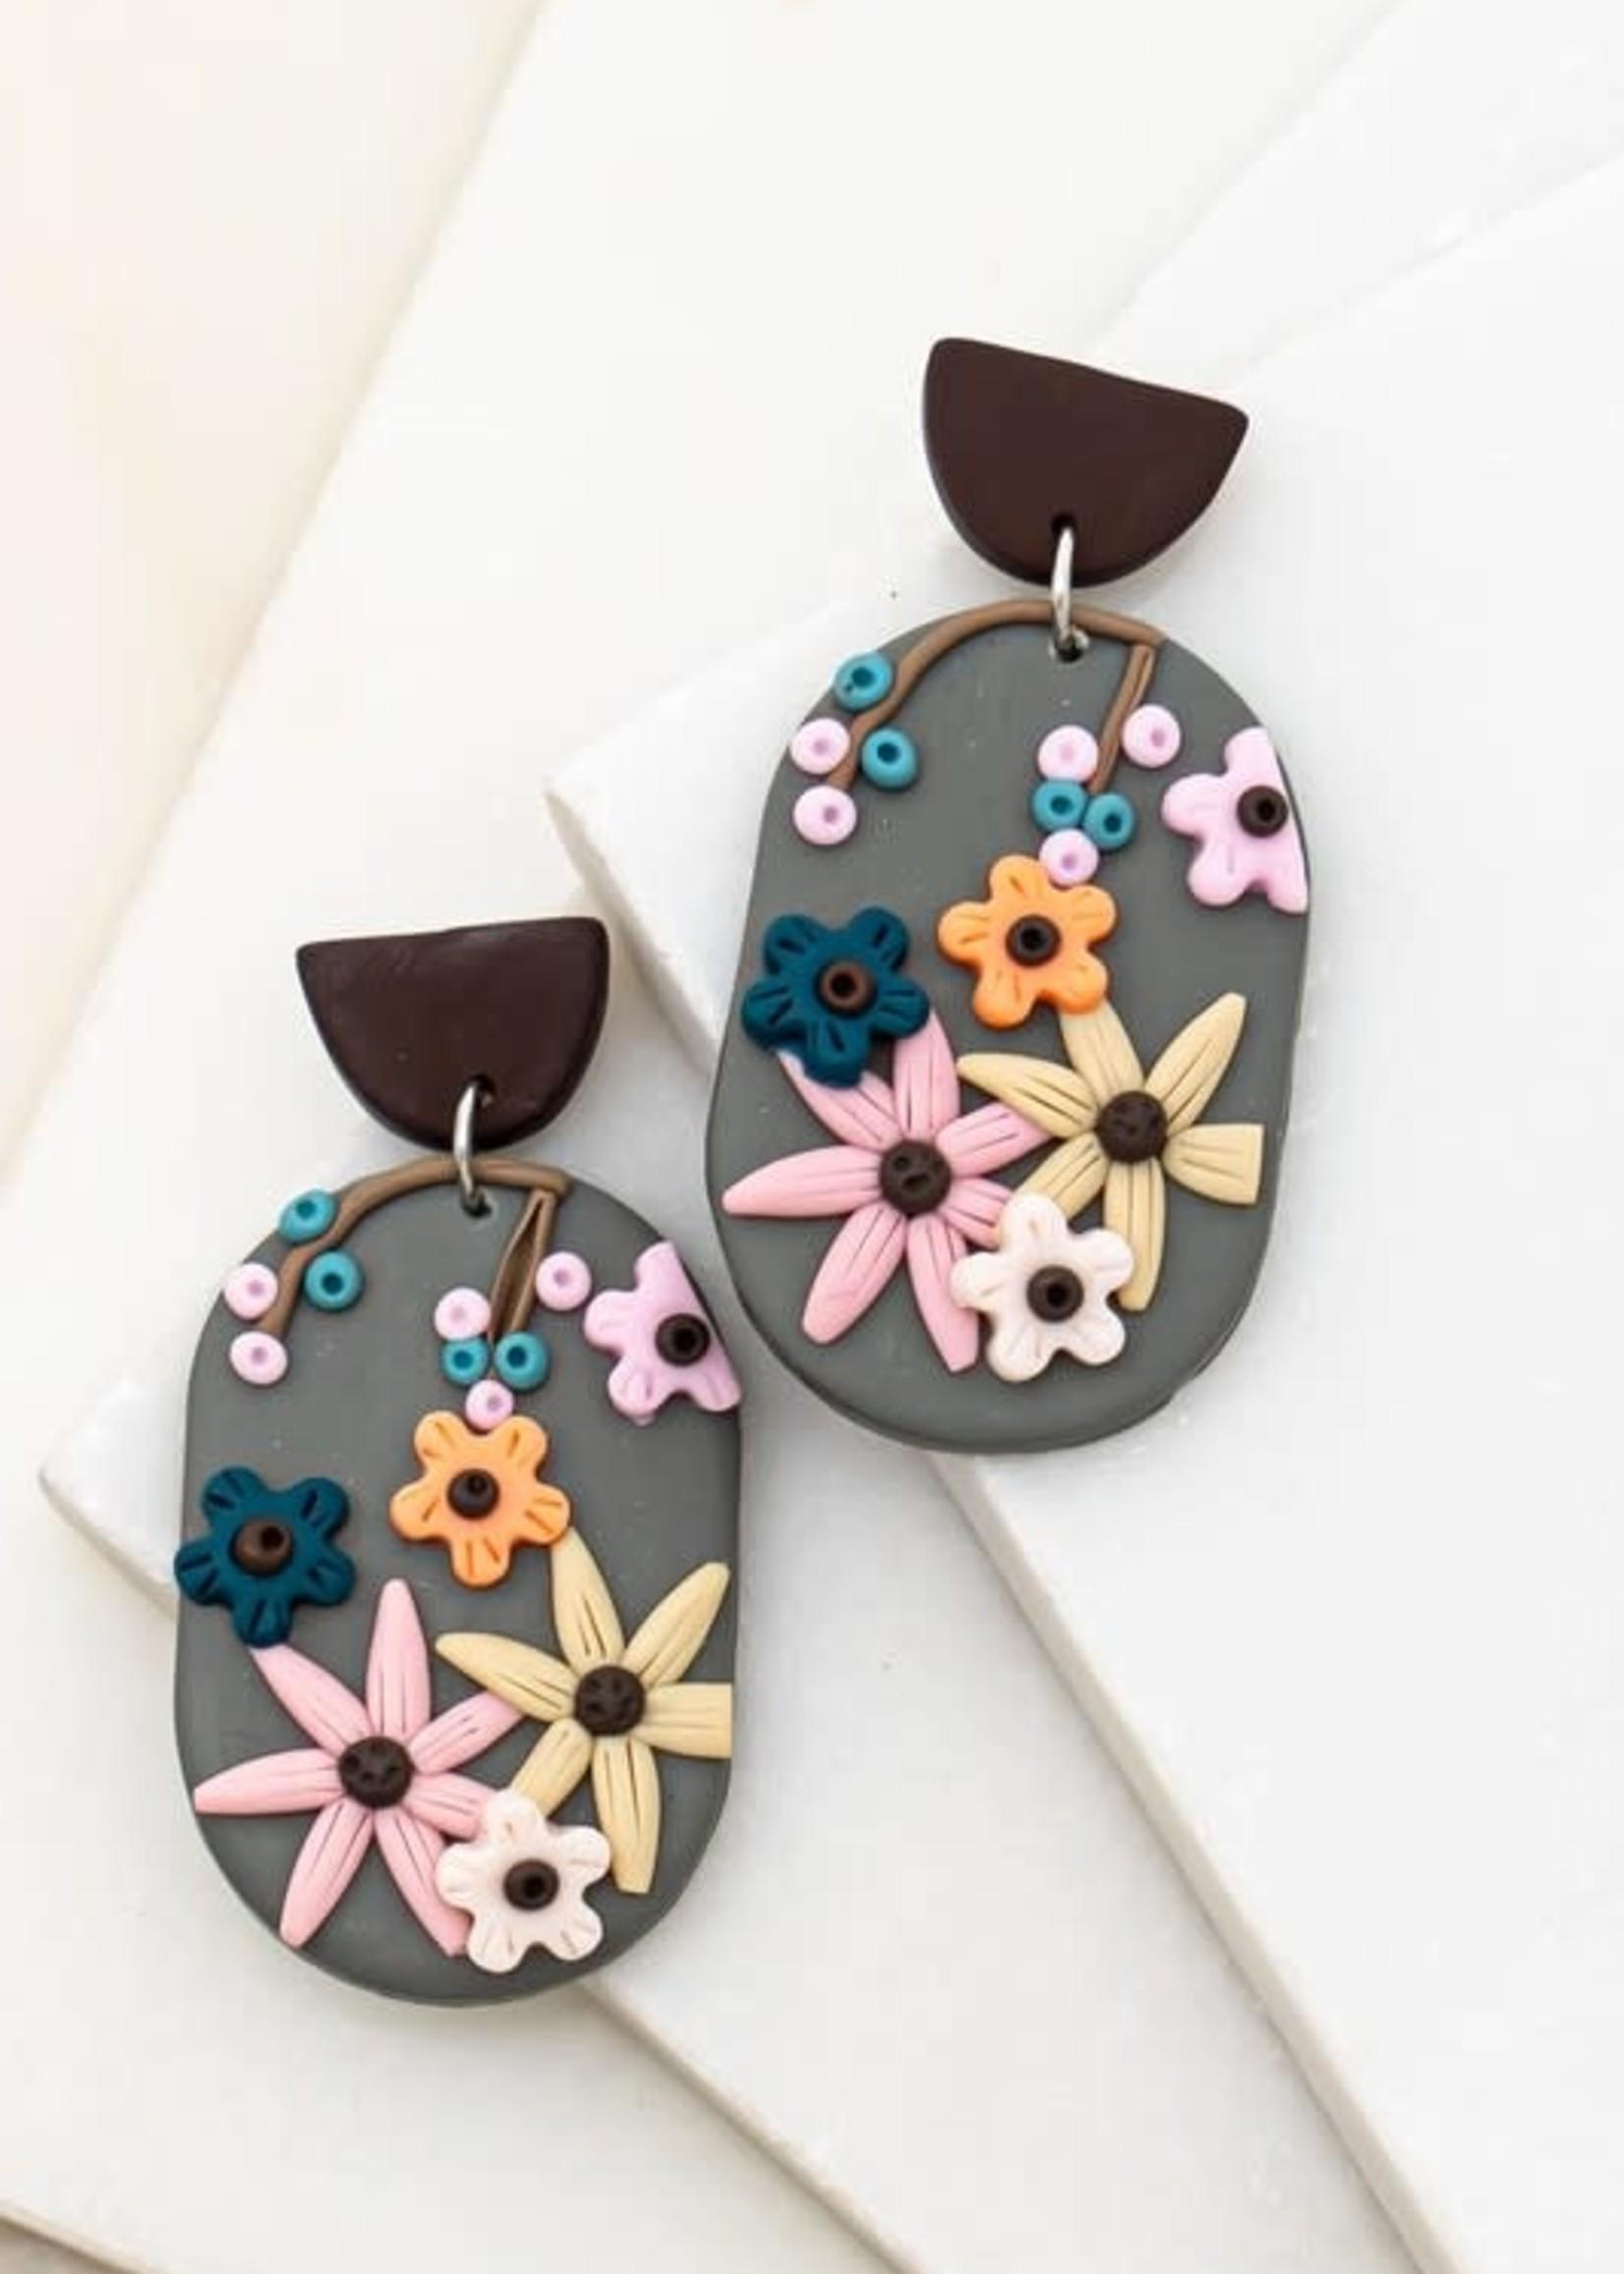 LA 3 Accessories Polymer Clay Oval Earrings